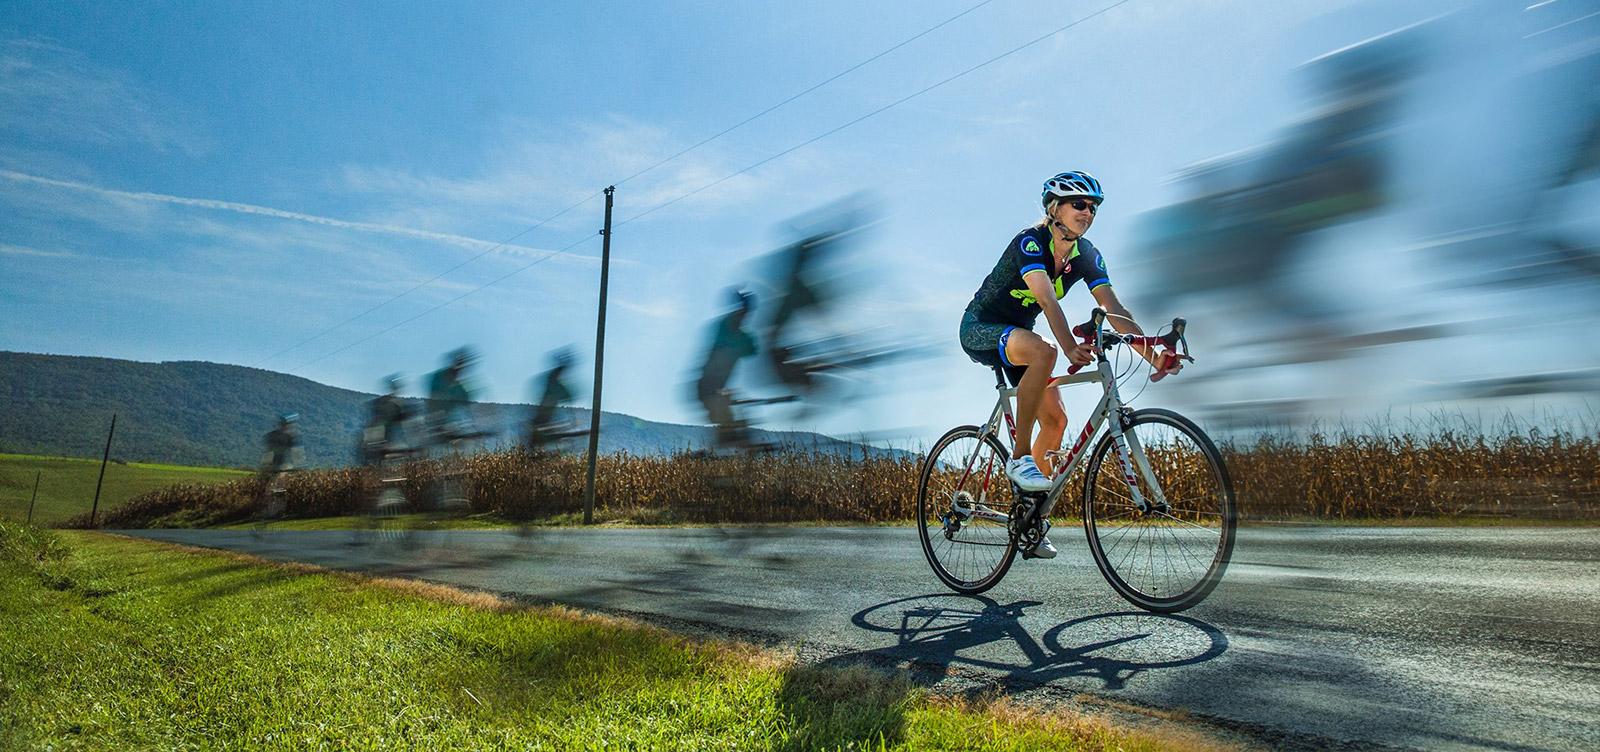 Cycling in Shenandoah County